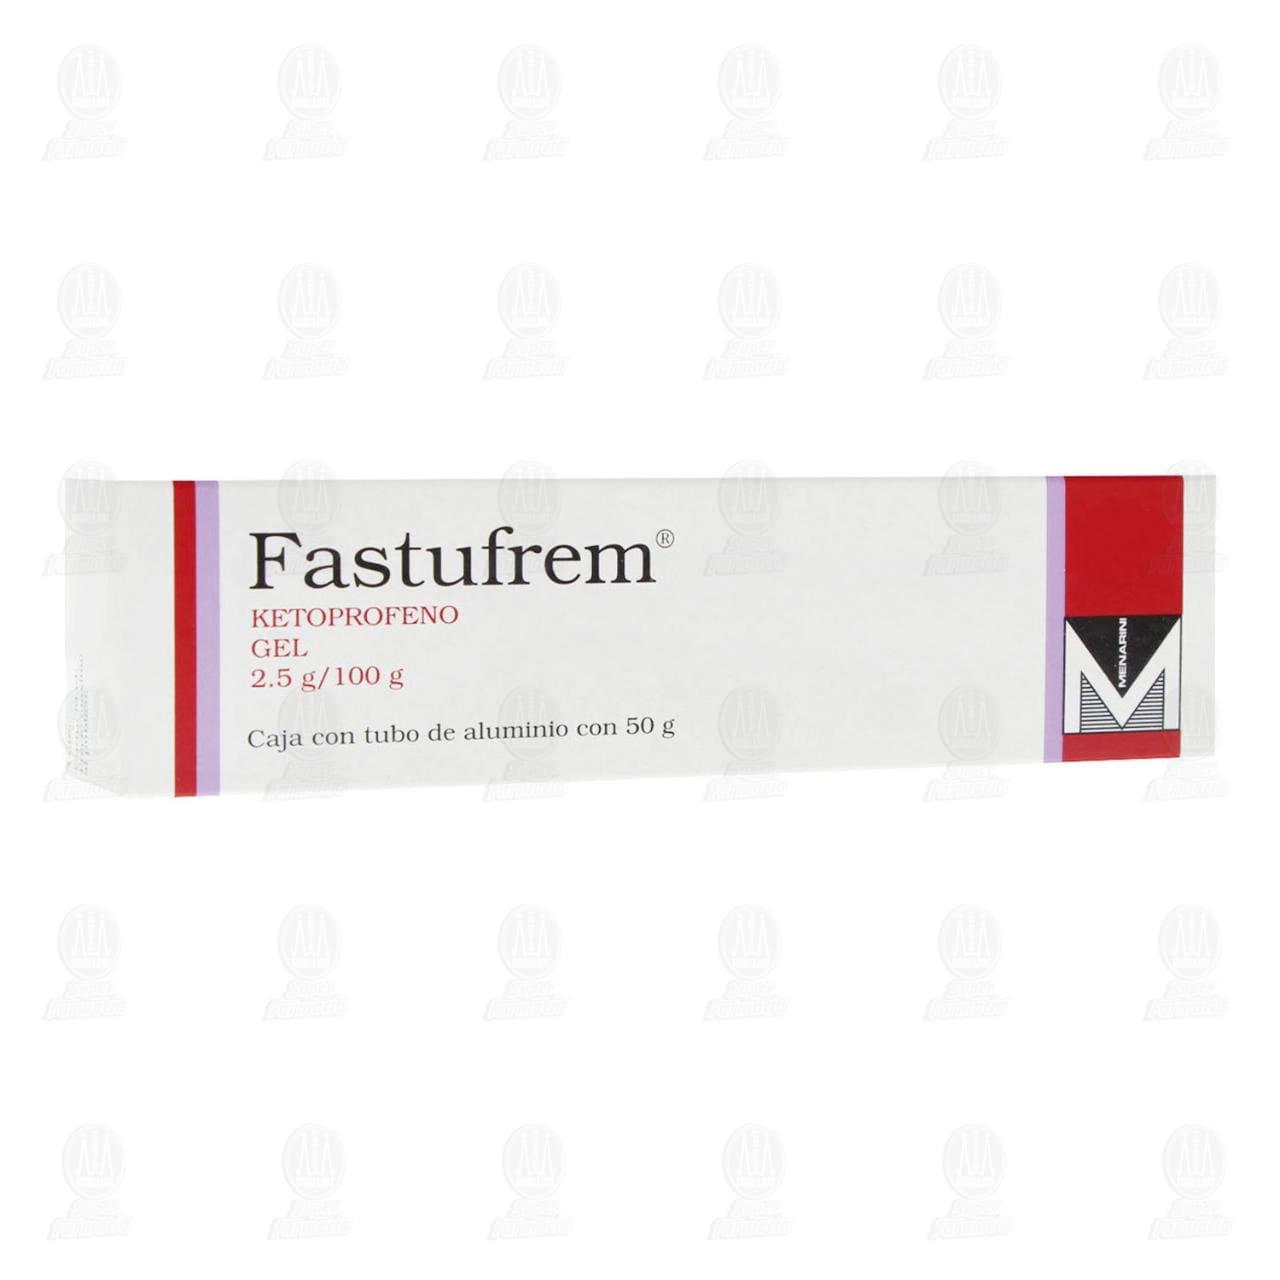 Comprar Fastufrem Gel 2.5gr/100gr Tubo 50gr en Farmacias Guadalajara